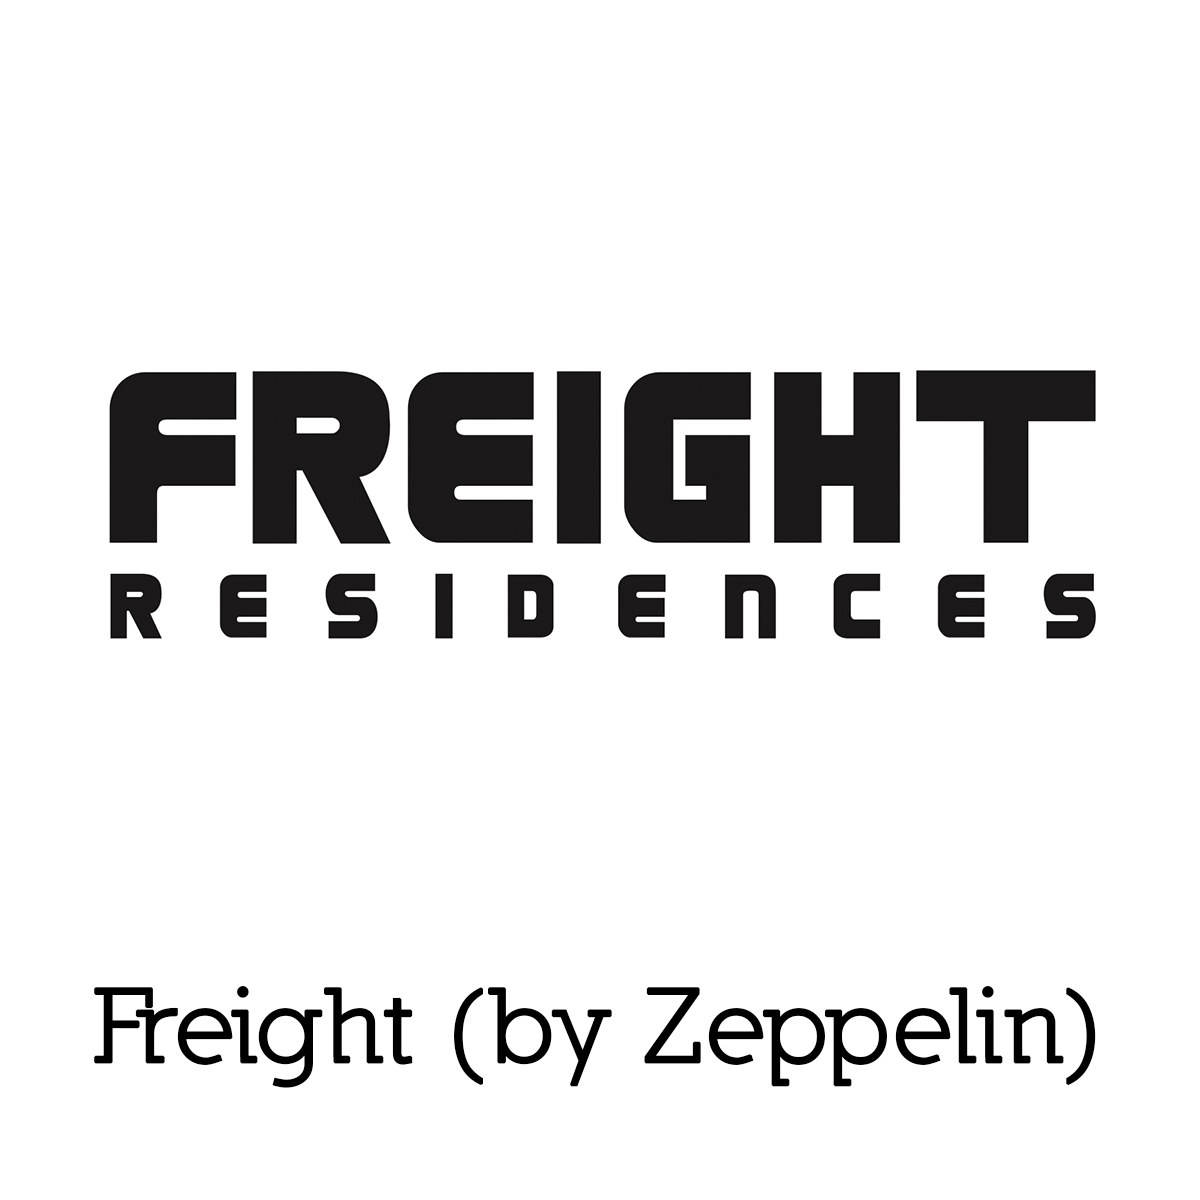 freight_resized-for-web.jpg